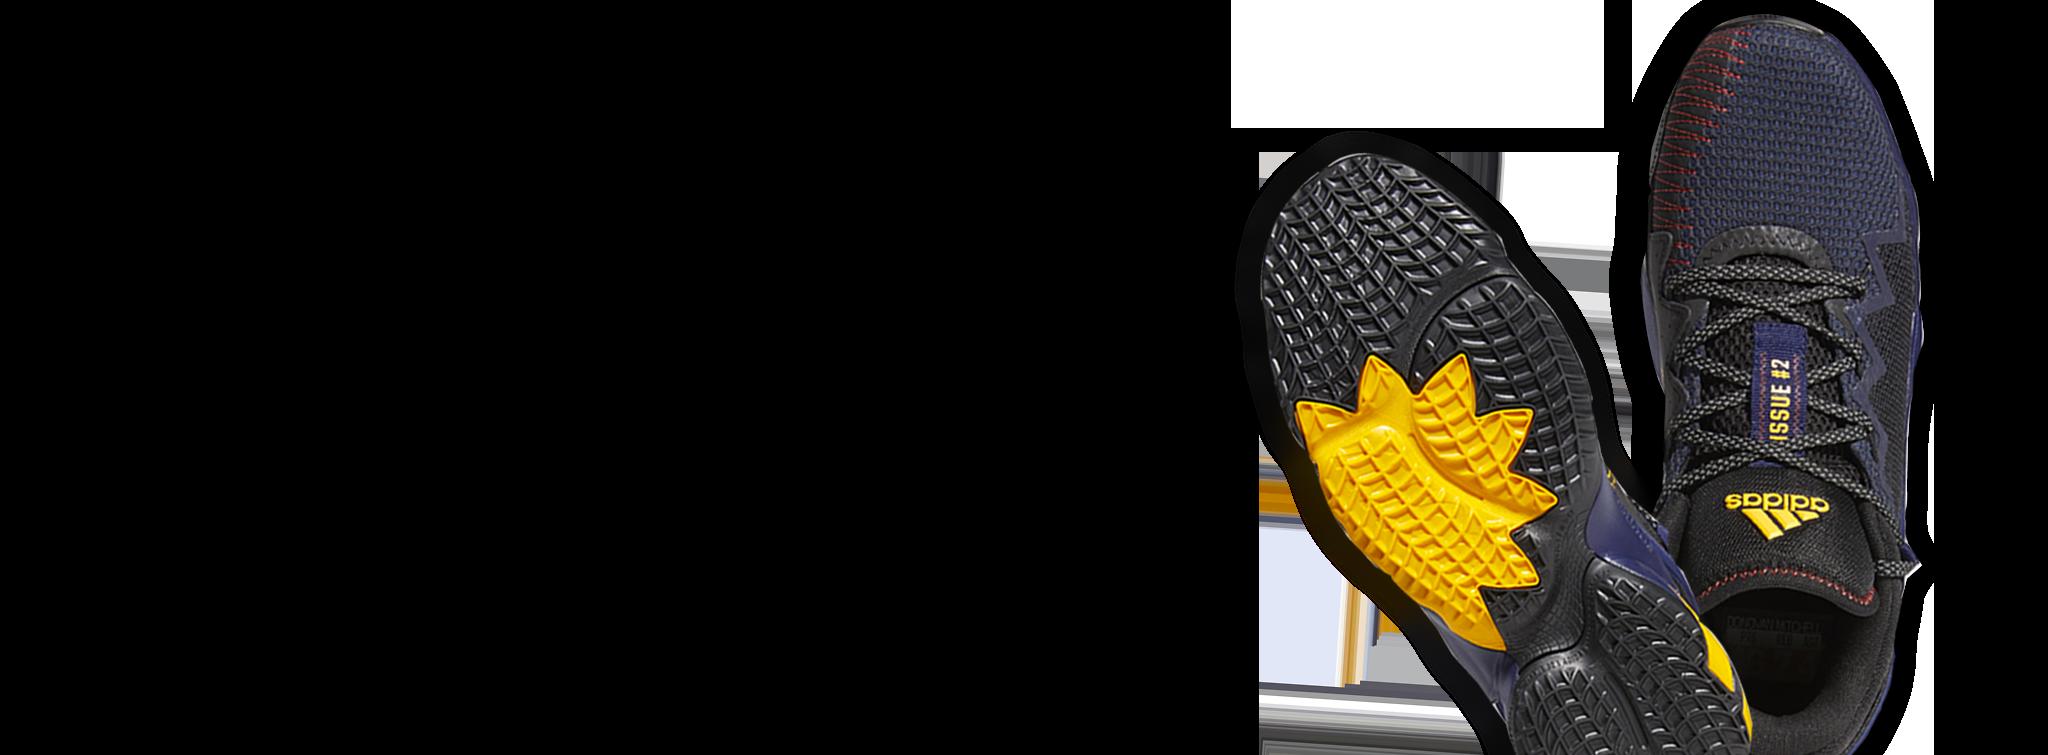 scarpe--10